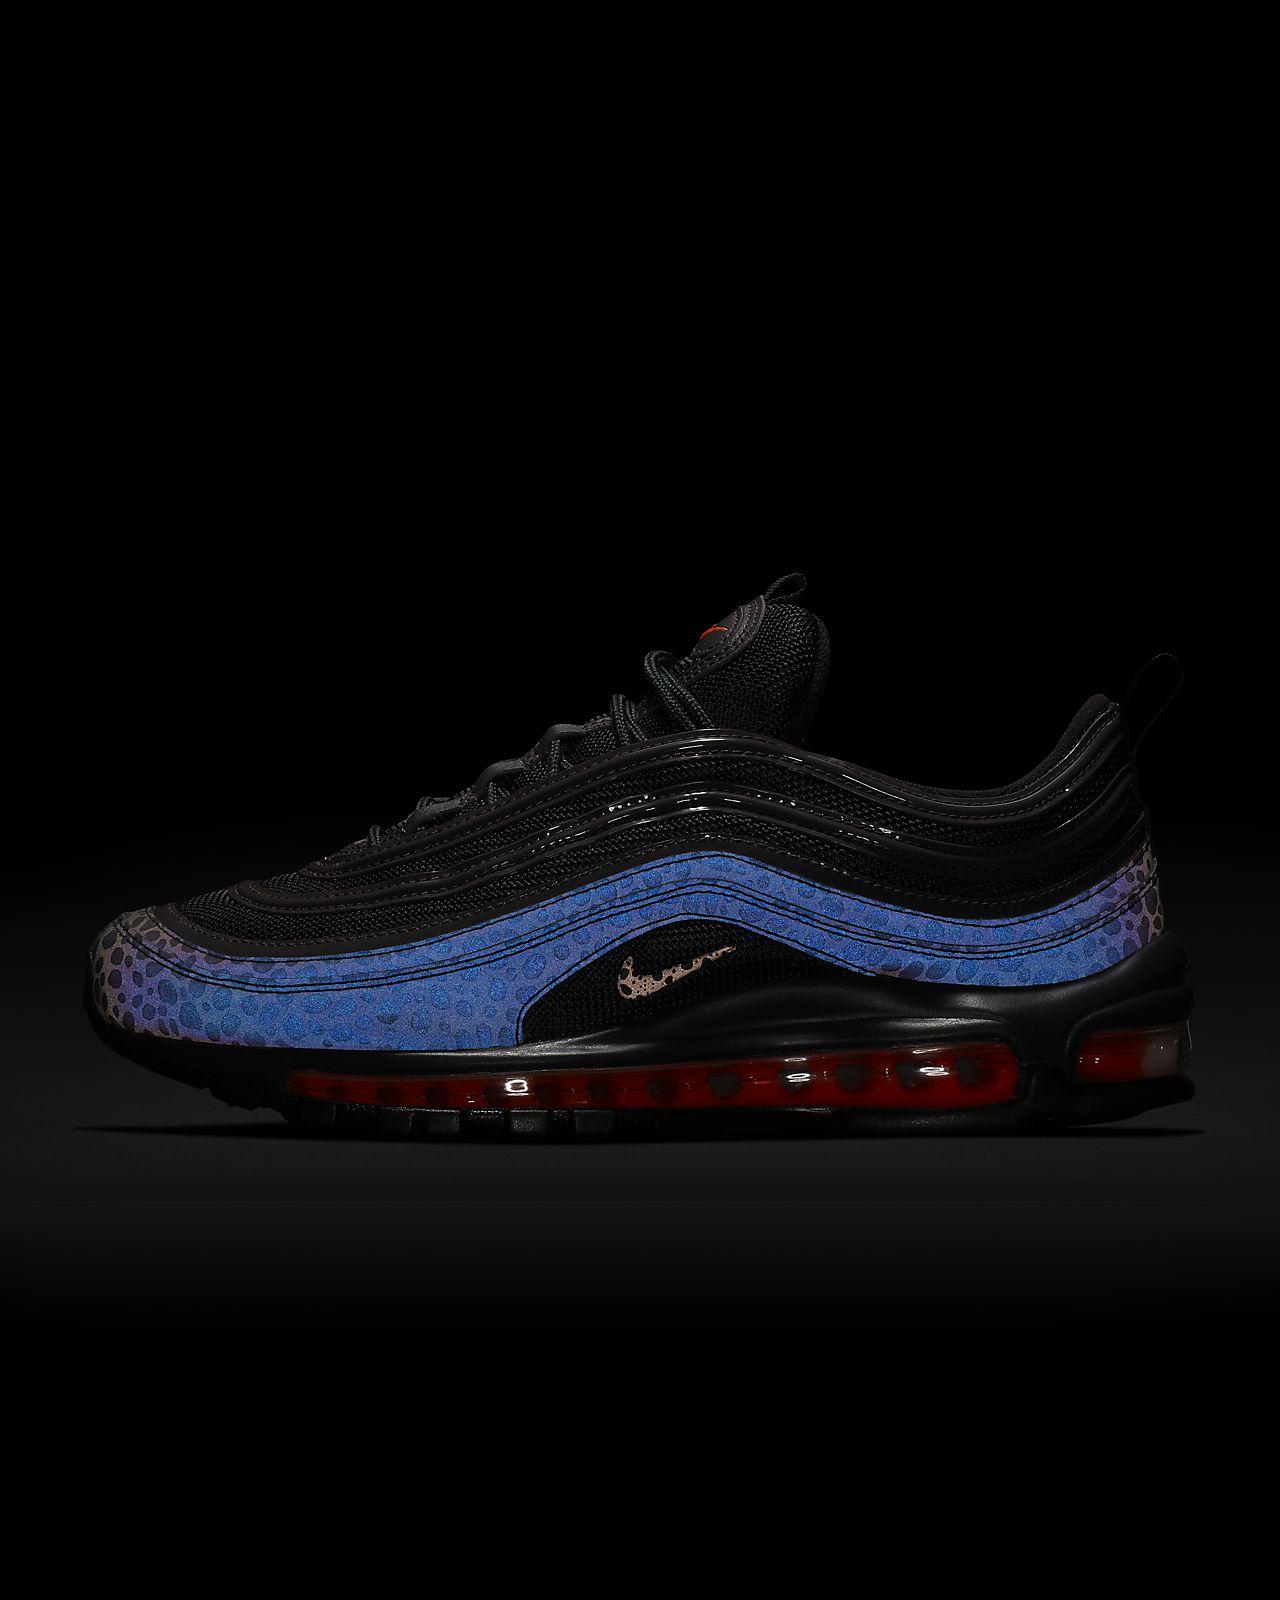 brand new ddc1b d0f9a Nike Air Max 97 SE Reflective Men's Shoe